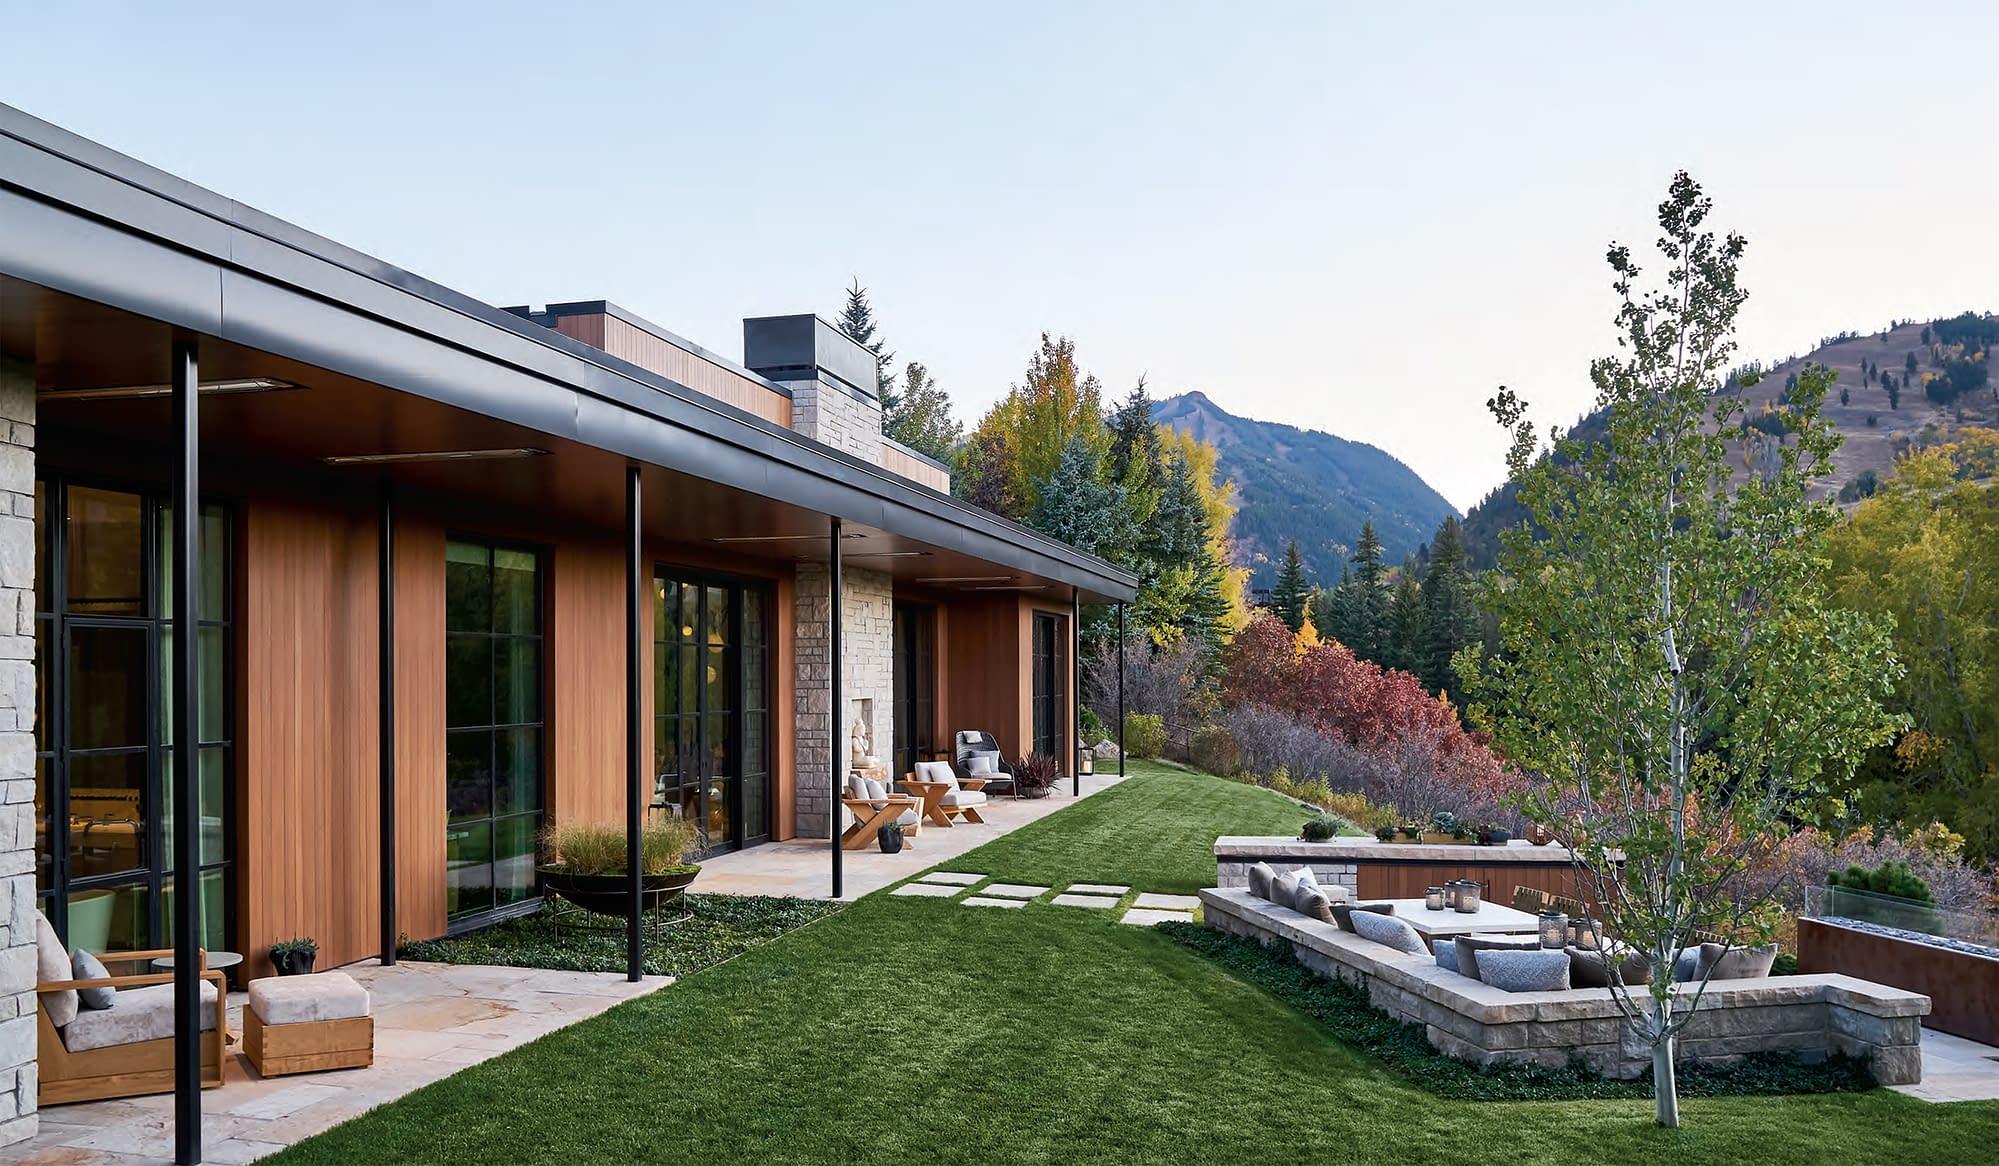 Custom steel windows by Brombal blend harmoniously with Aspen's landscape.